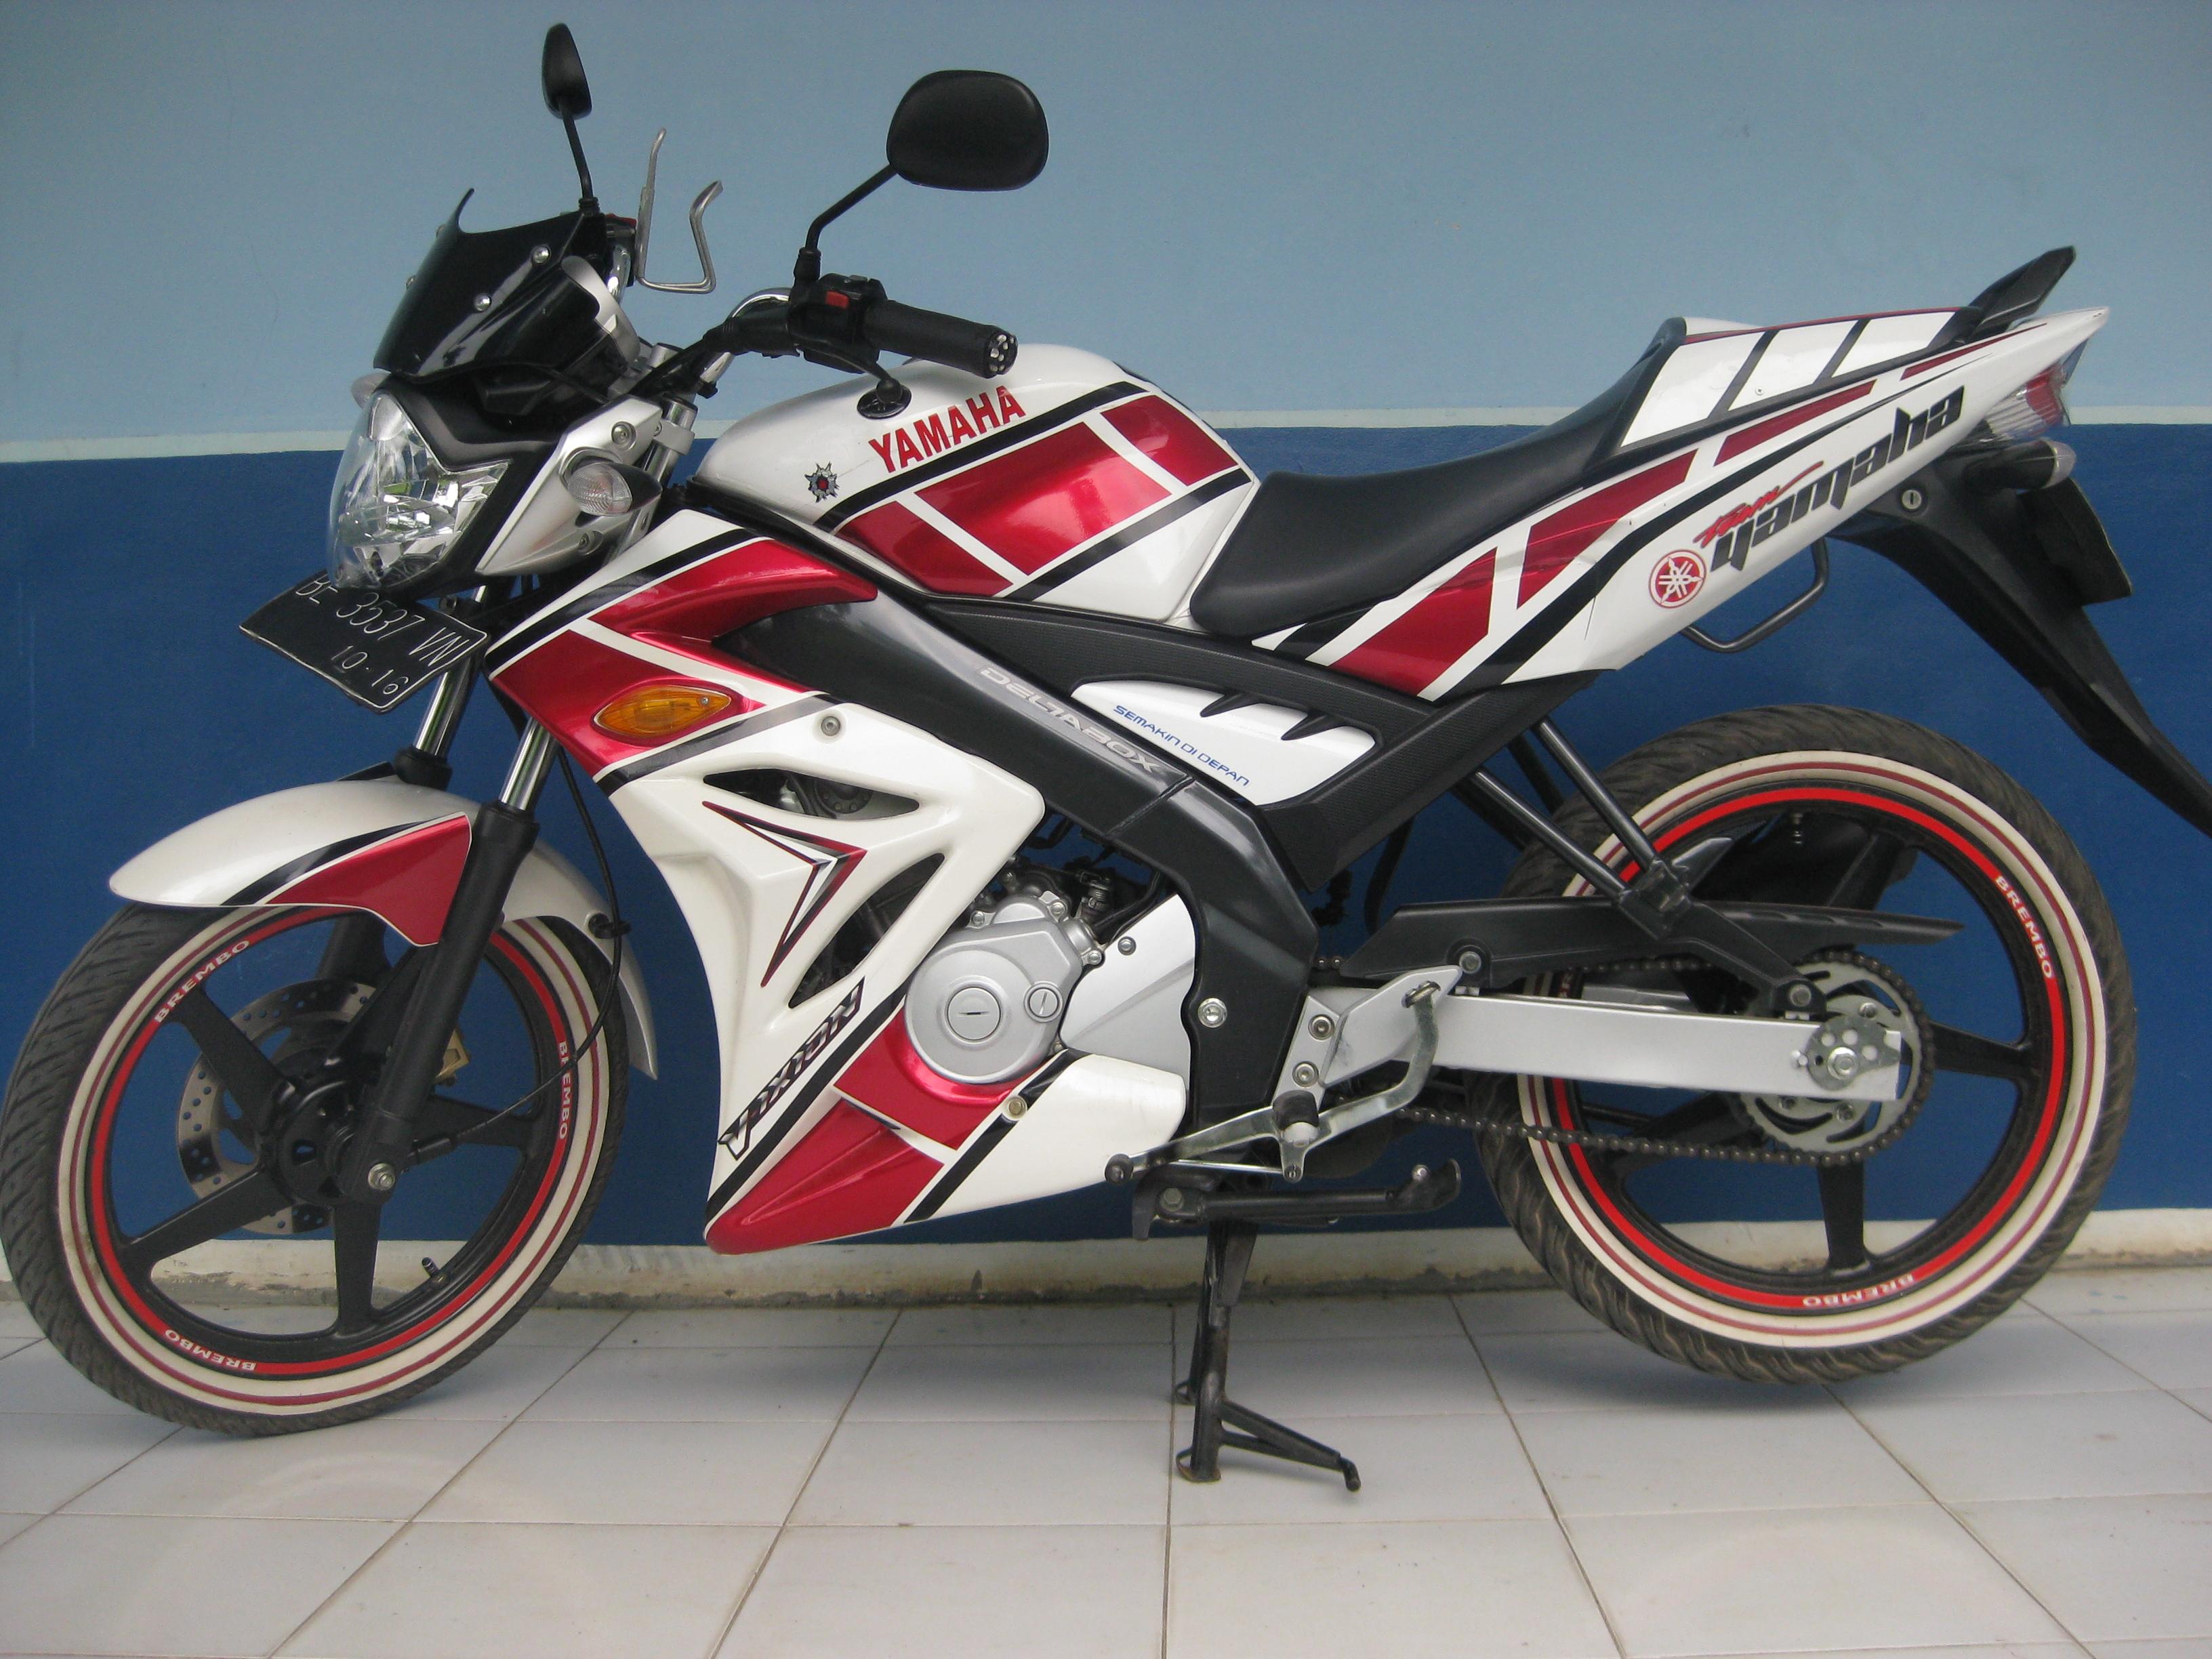 Modifikasi Yamaha Vixion Velg Tapak Lebar   Cara Modifikasi Motor